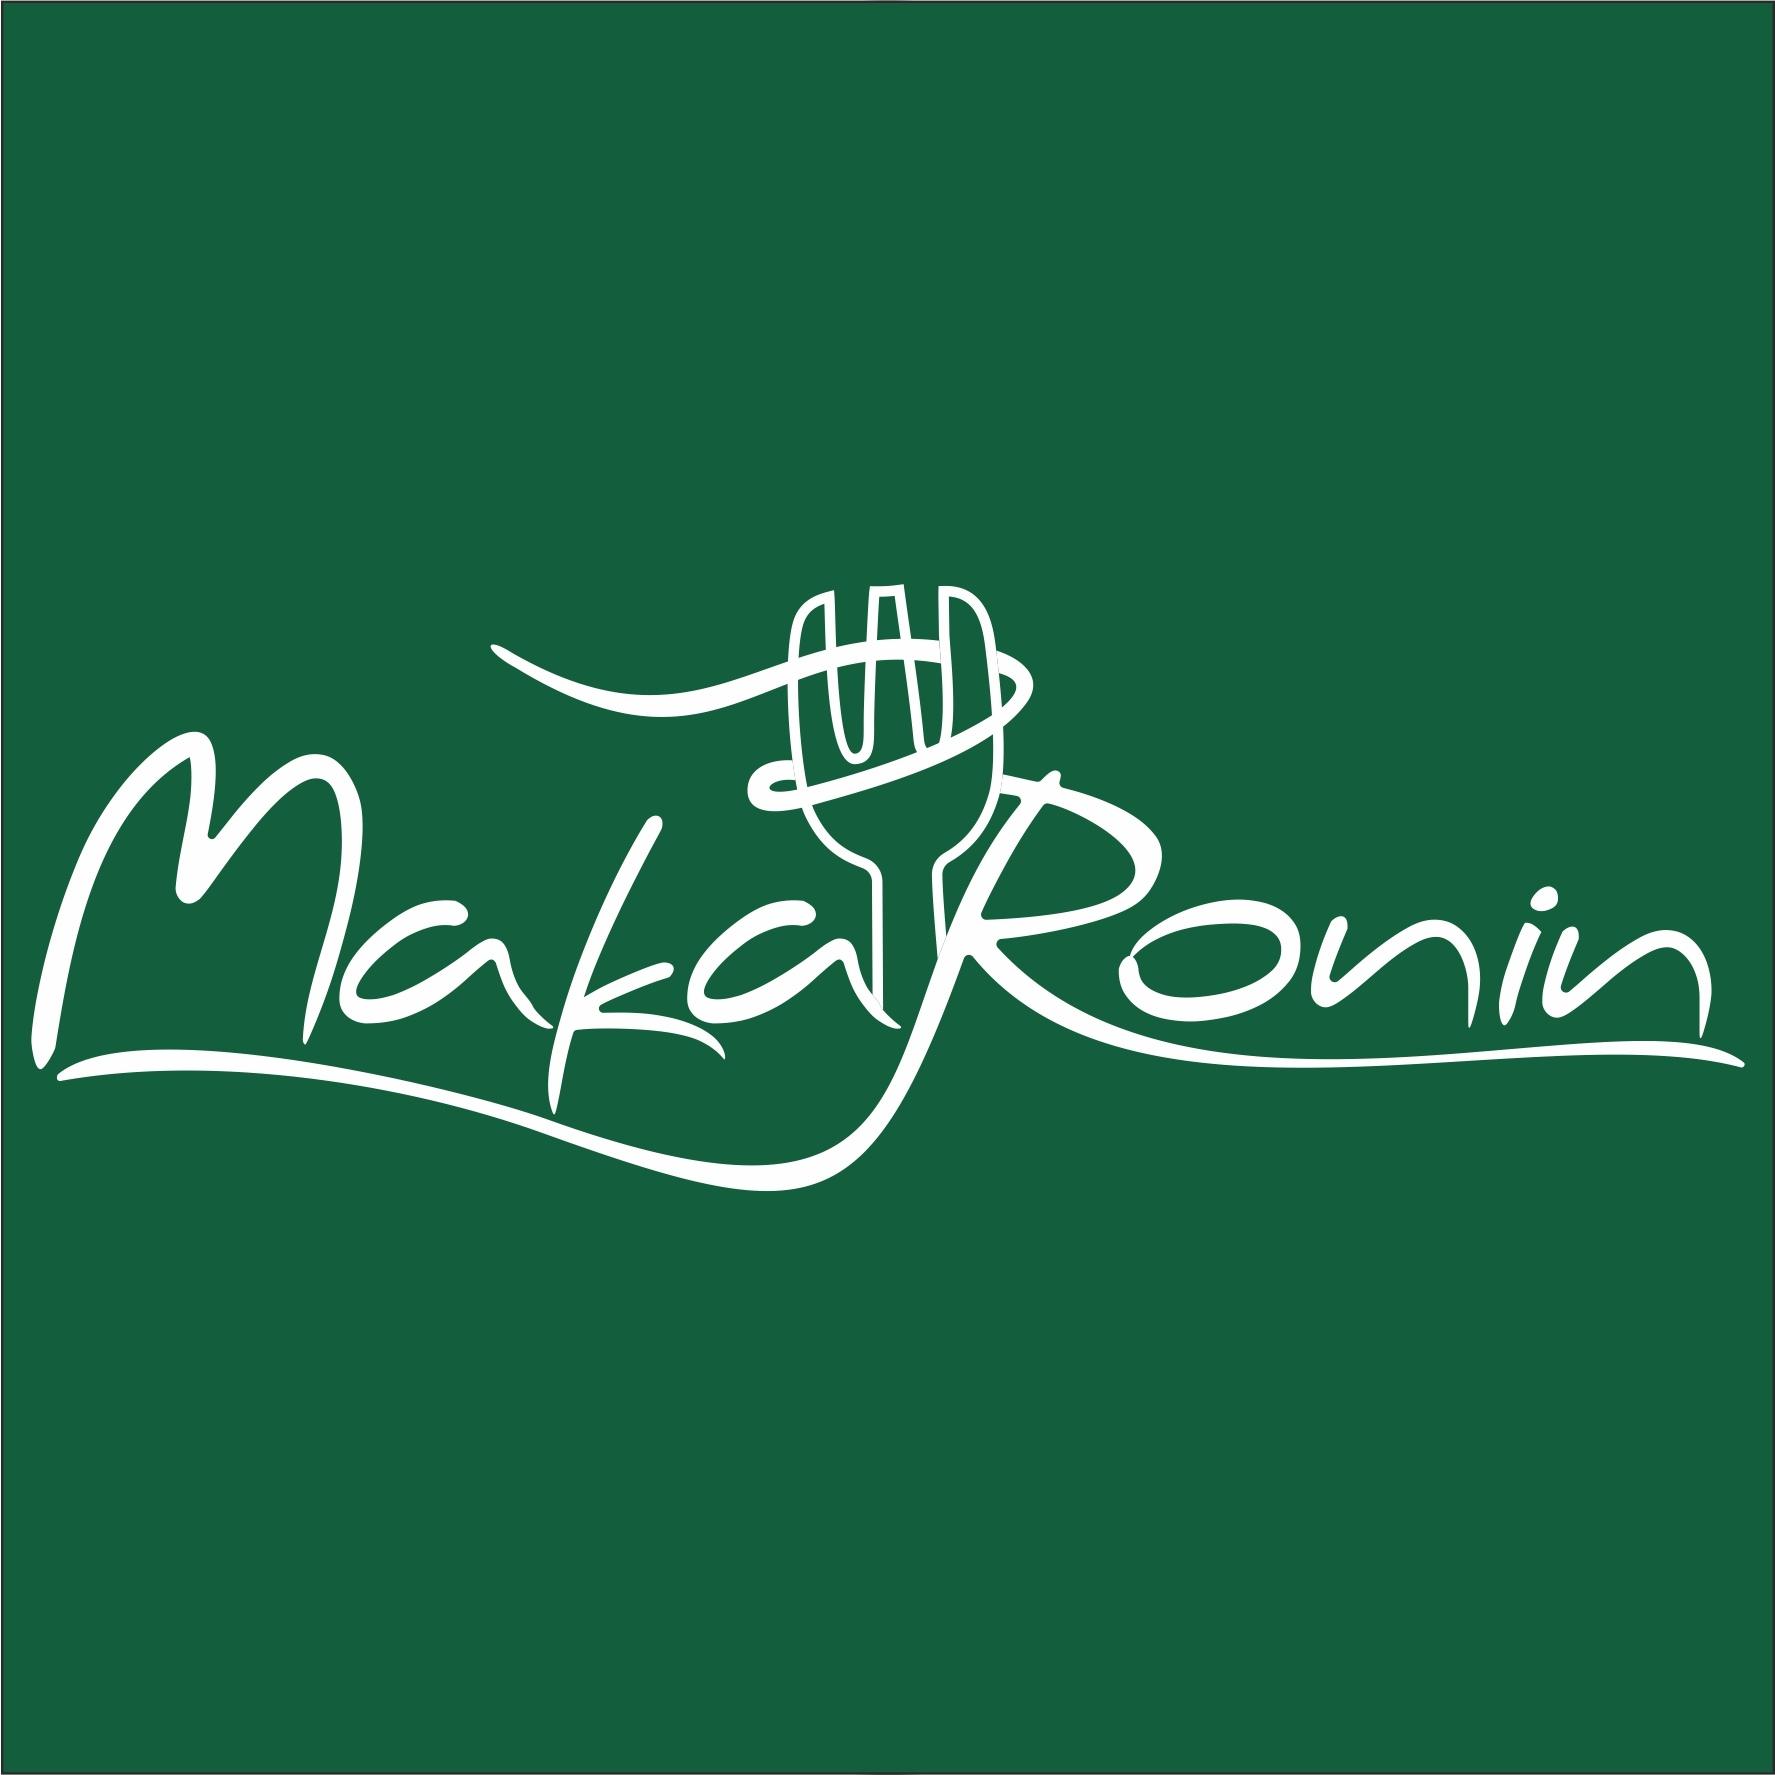 МакаРонин / MakaRonin